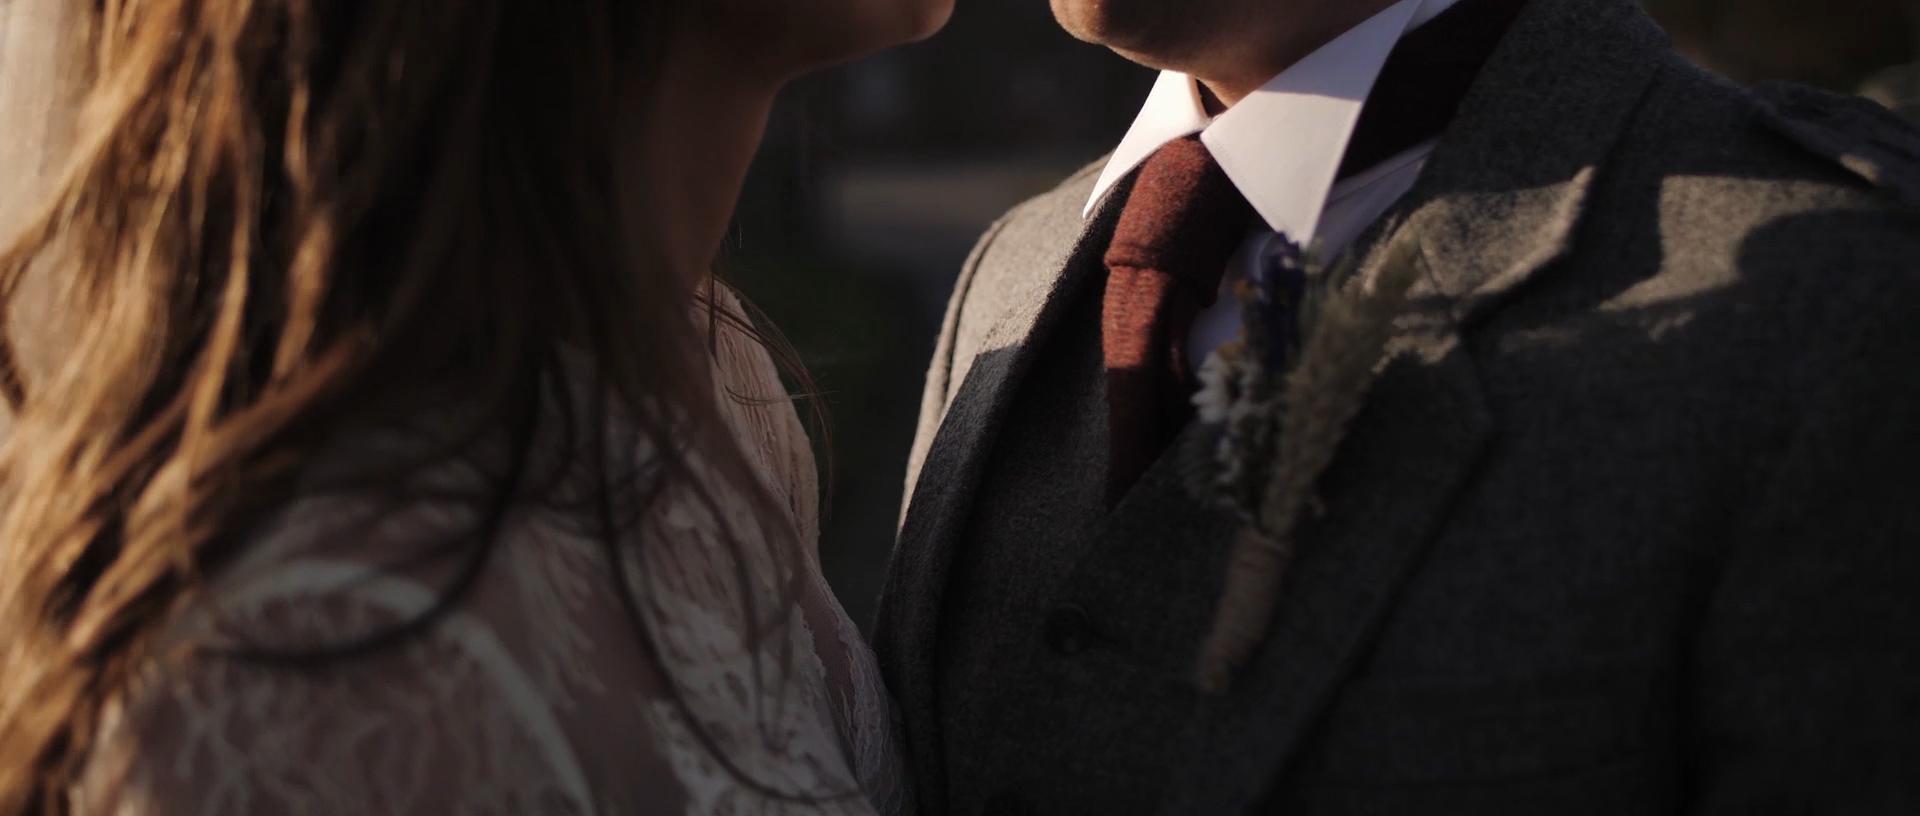 oswald-house-hotel-wedding-videographer_LL_04.jpg